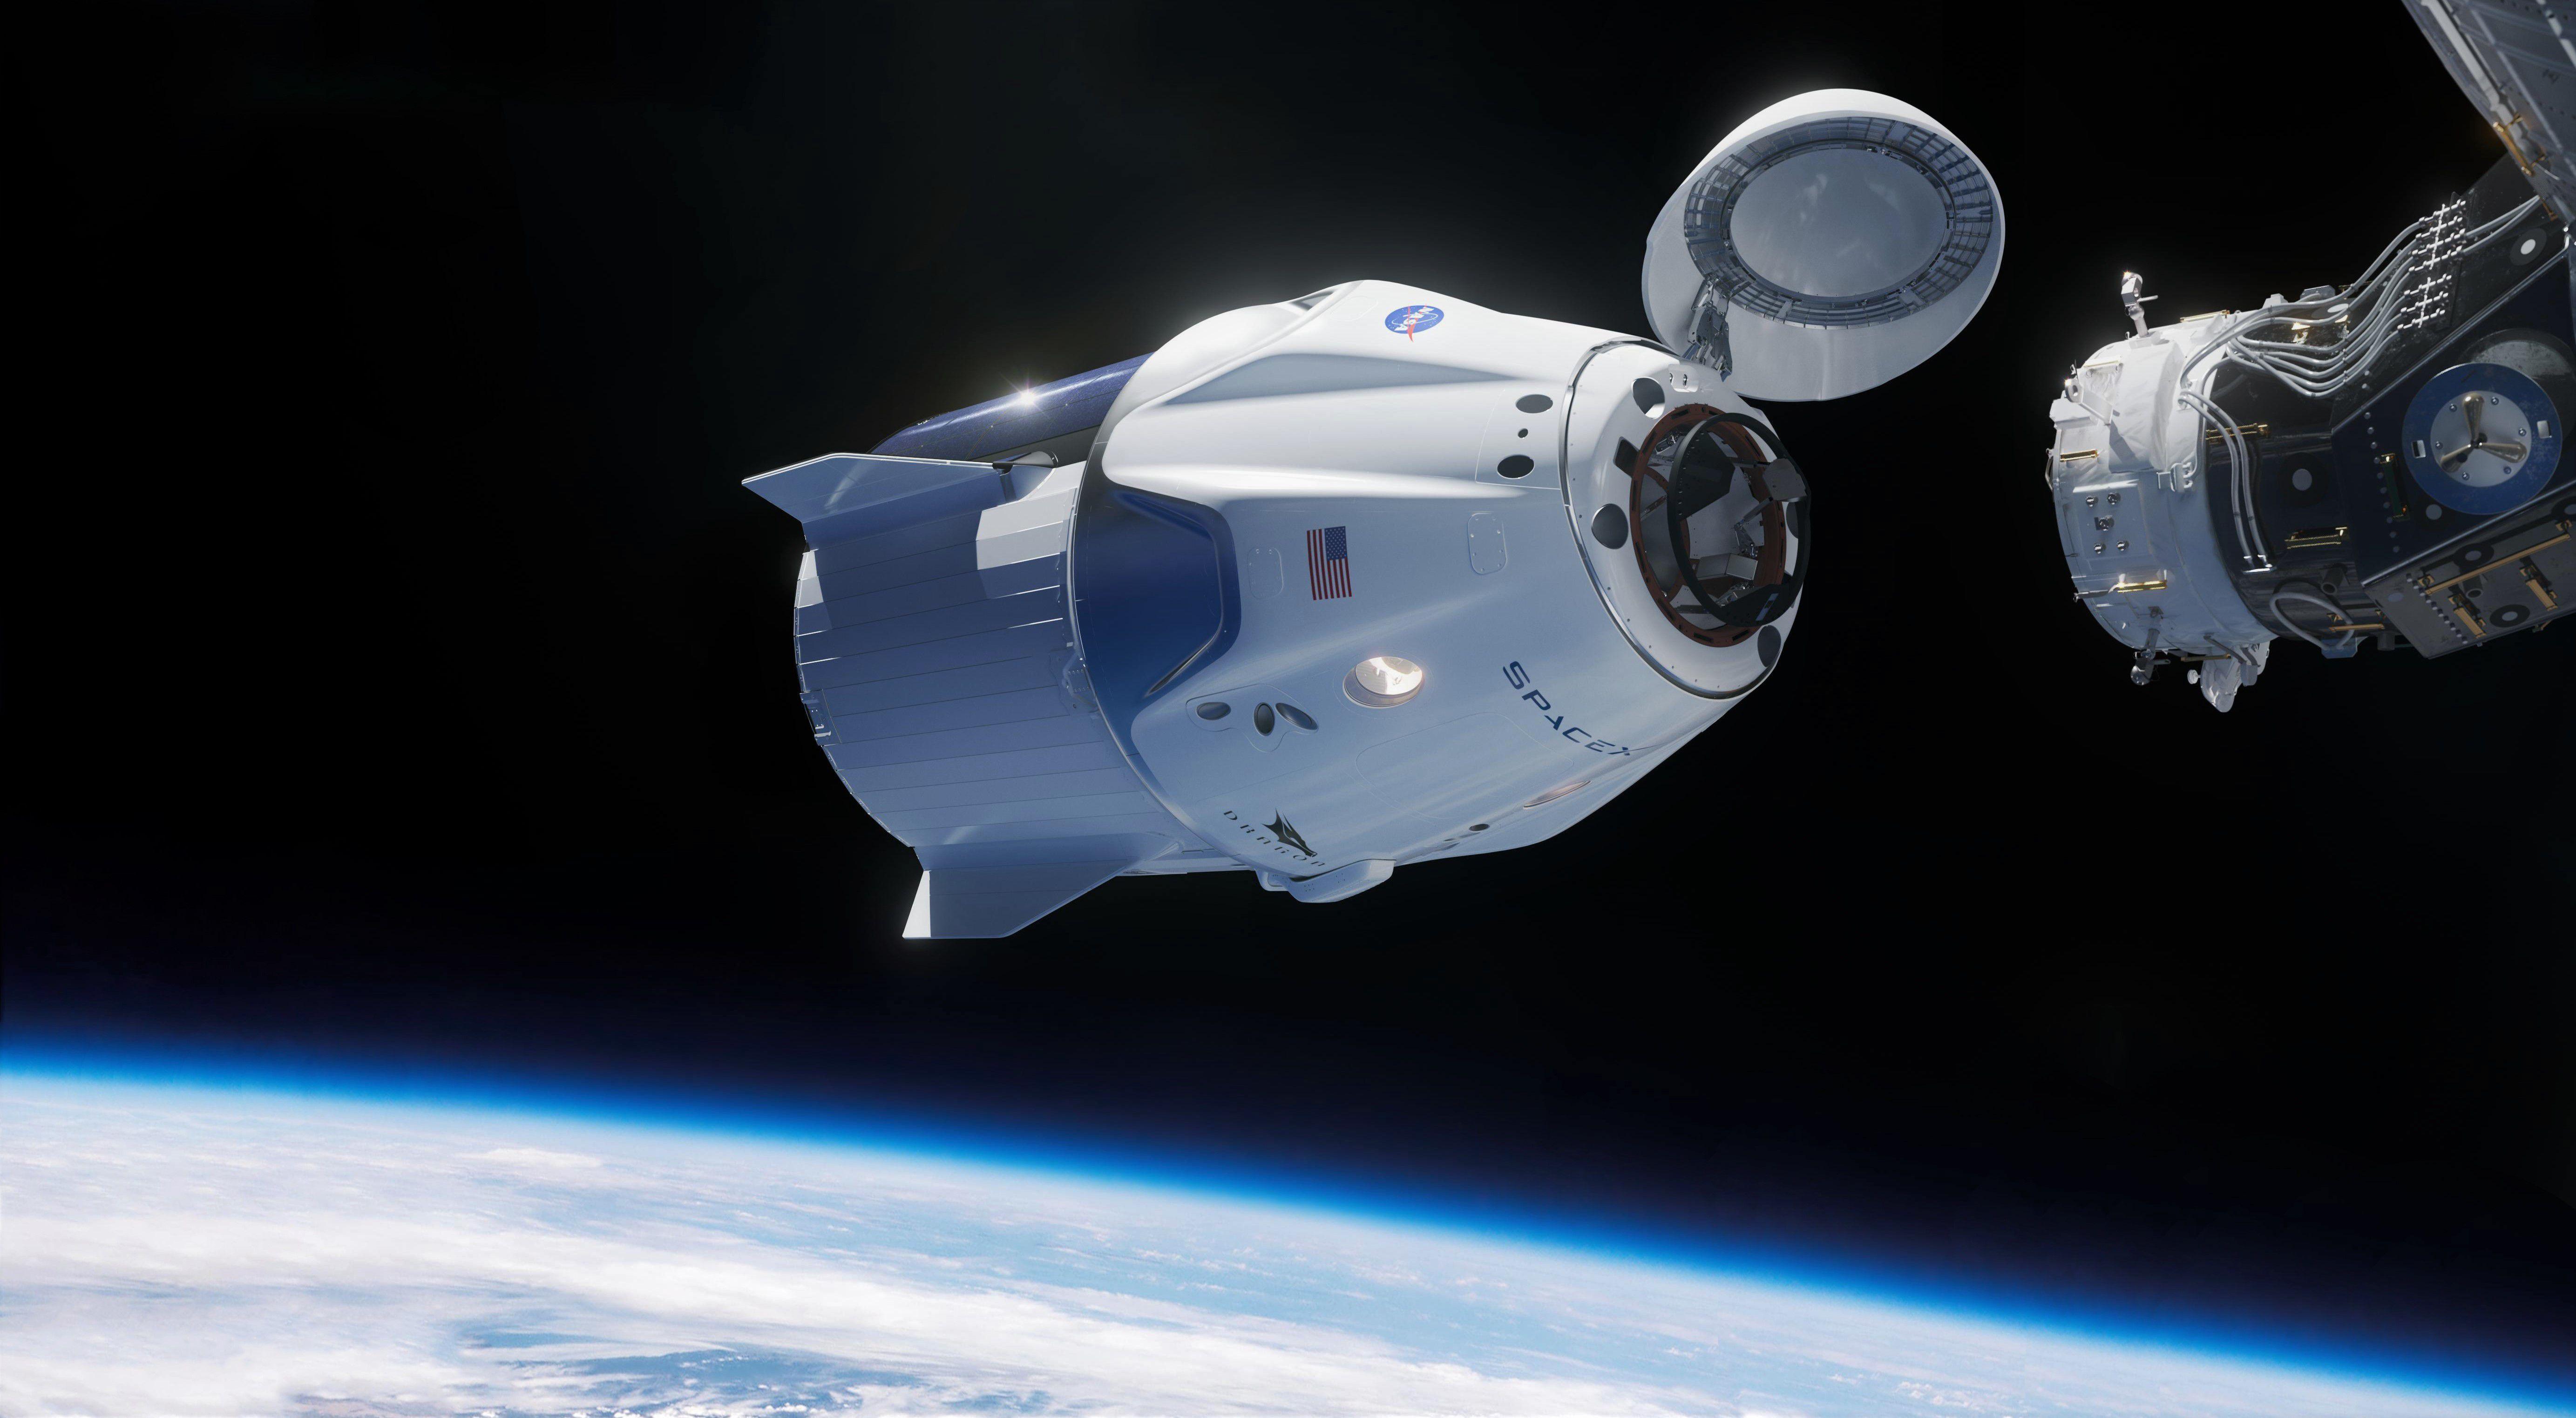 spacecraft crew - photo #22